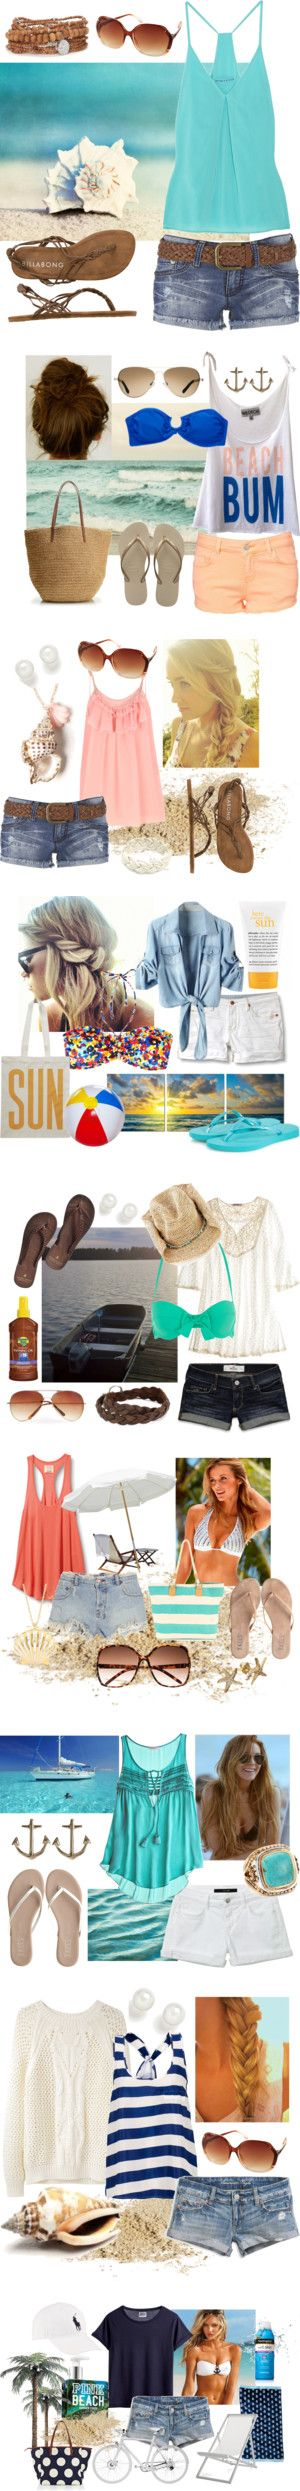 Beach/ Summer time styles